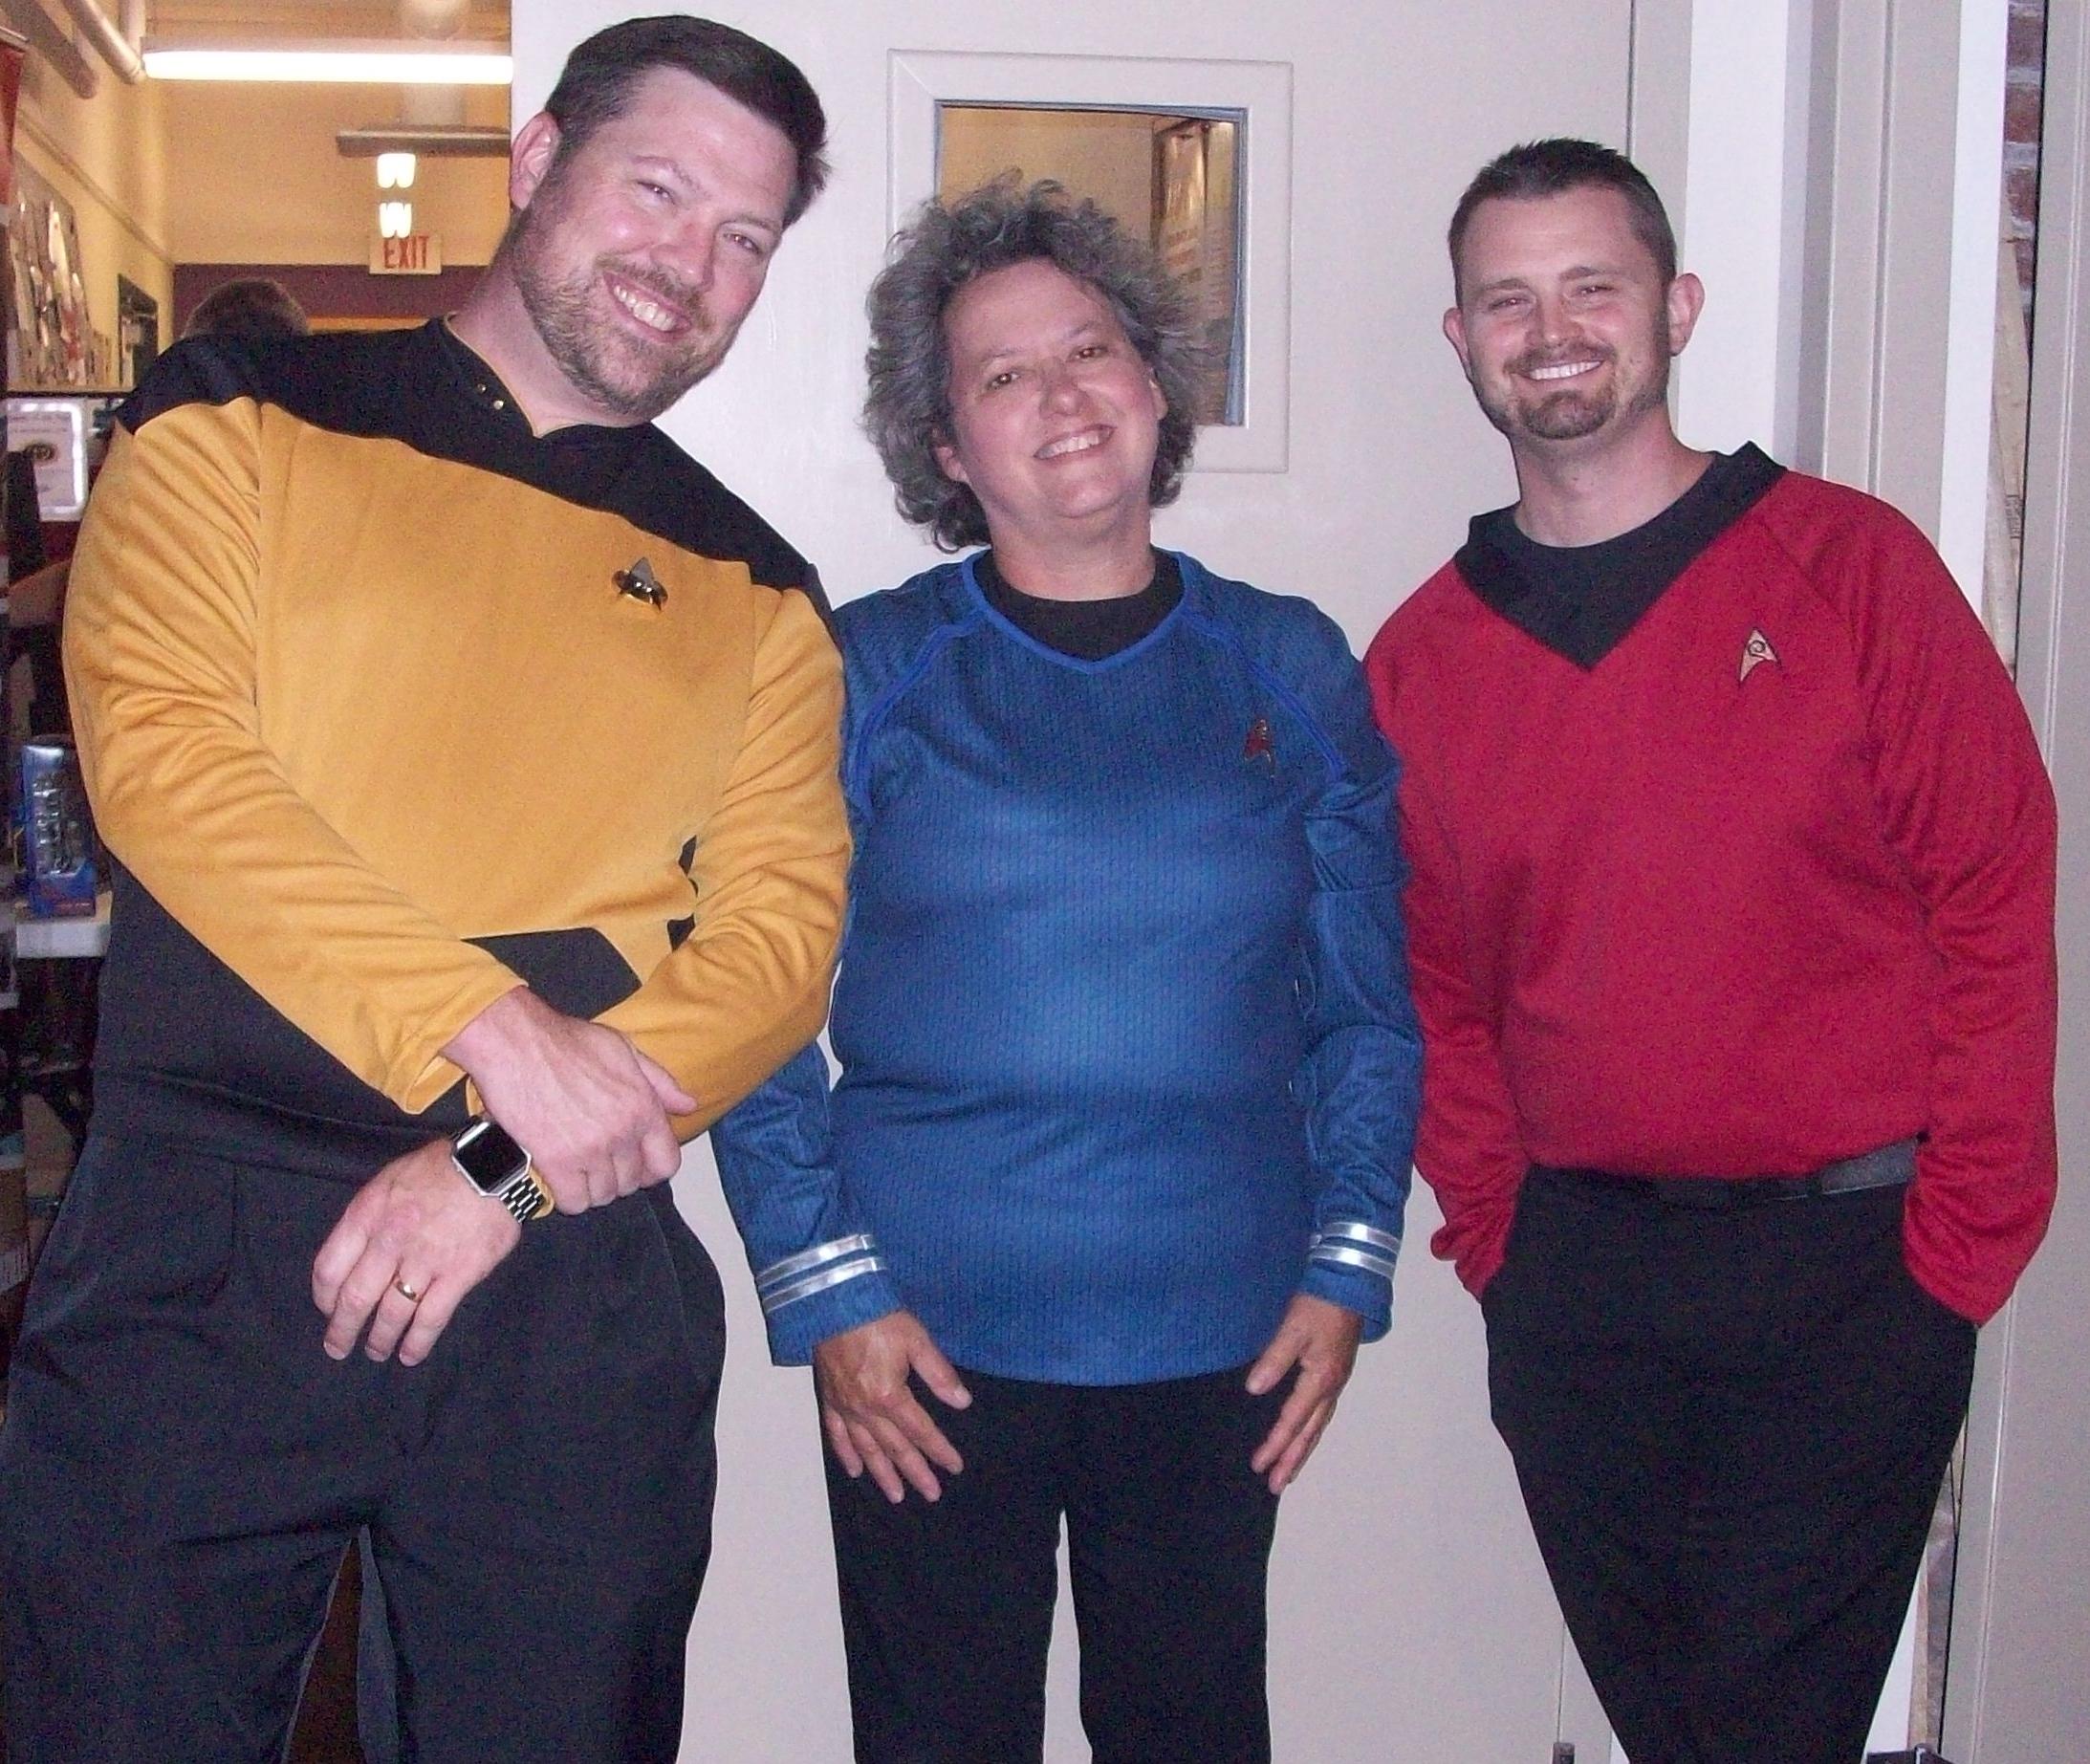 Jonathan, Pam, and Brett